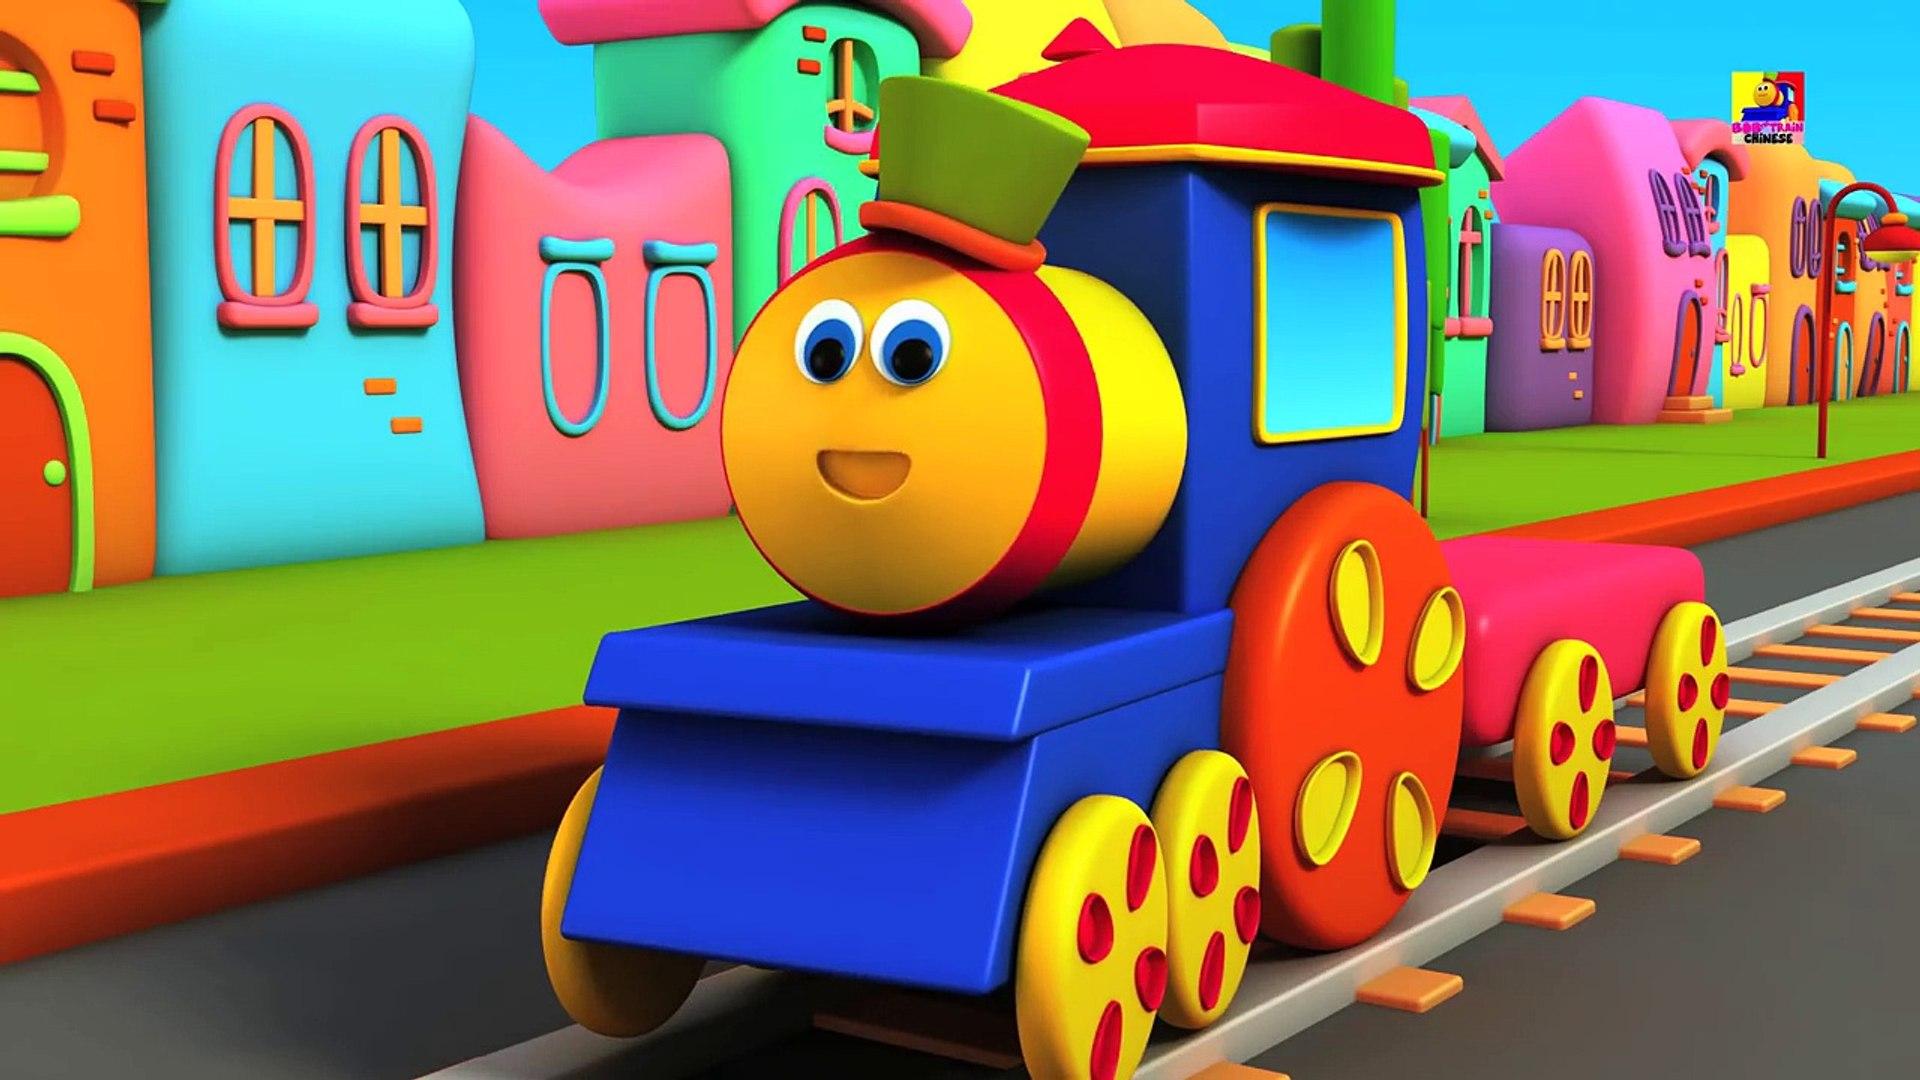 bob 运输火车   运输视频   学习车辆   Learn Transport with Bob   Bob The Train   3D Train   Bob Transpo